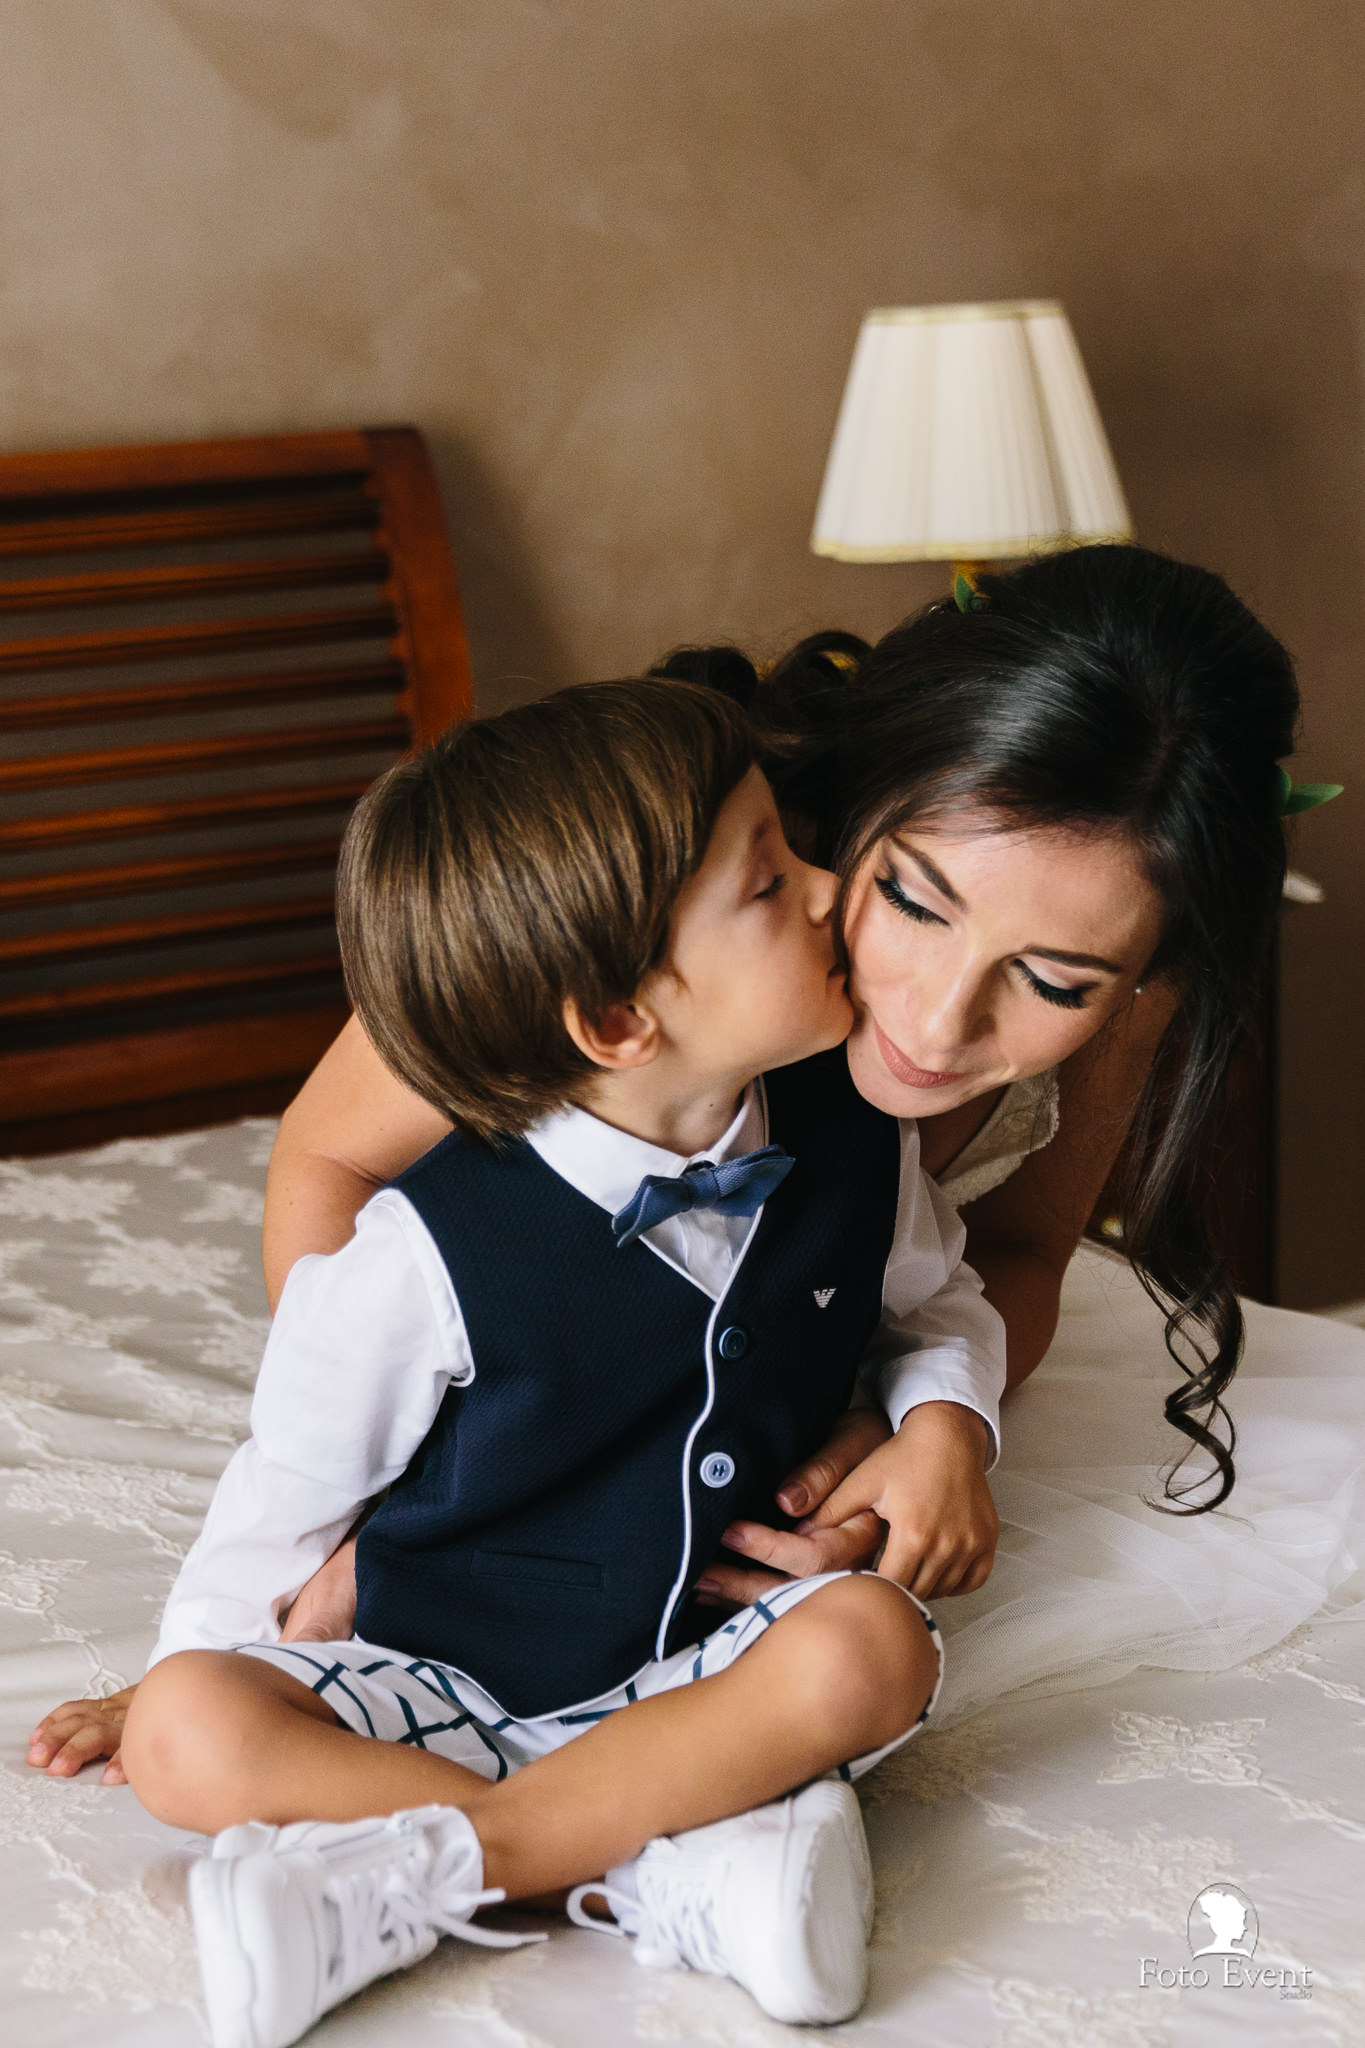 001-2019-08-23-Matrimonio-Lucia-e-Rosario-Scopelliti-5DE-754